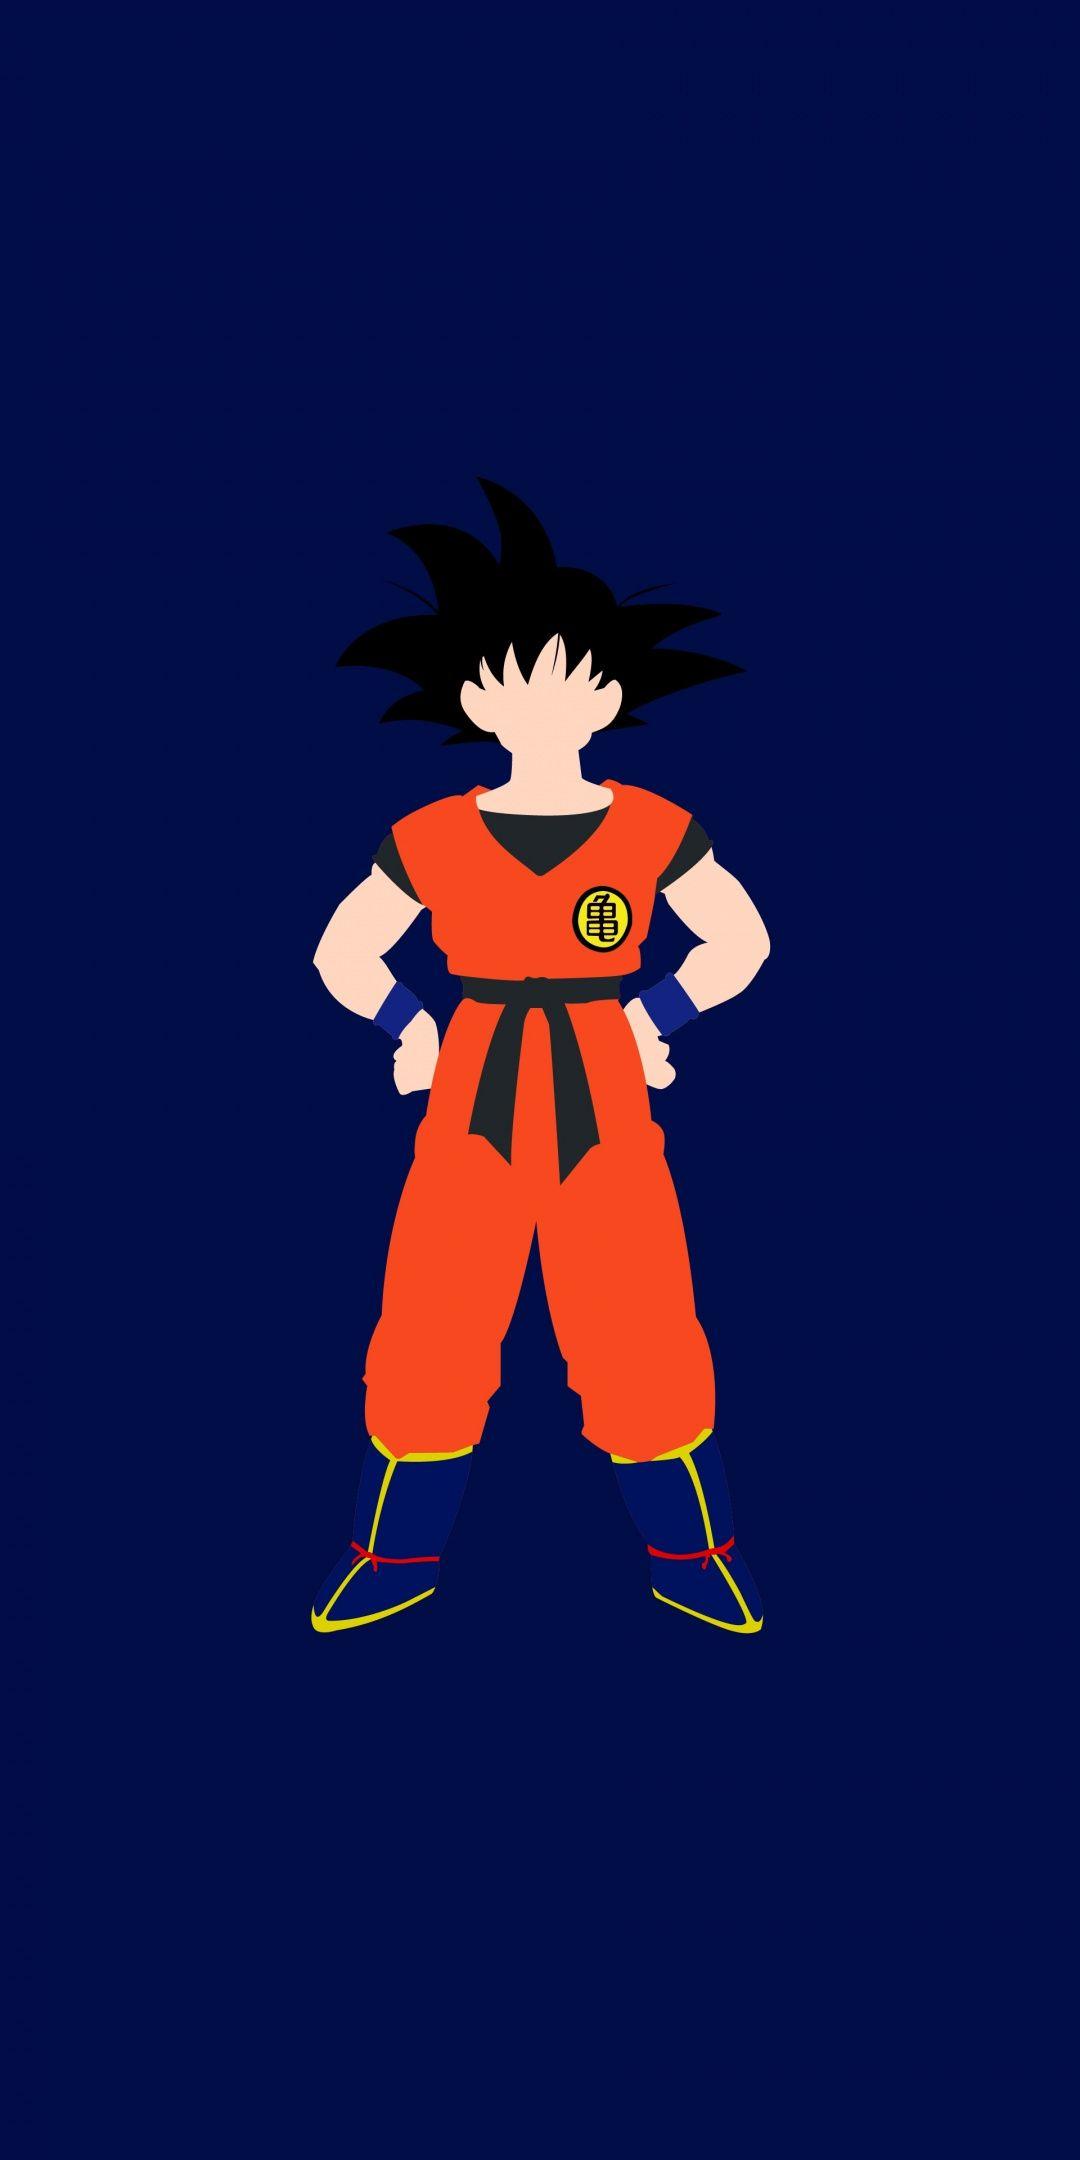 Minimal Goku Dragon Ball Art 1080x2160 Wallpaper Iron Man Art Goku Art Dragon Ball